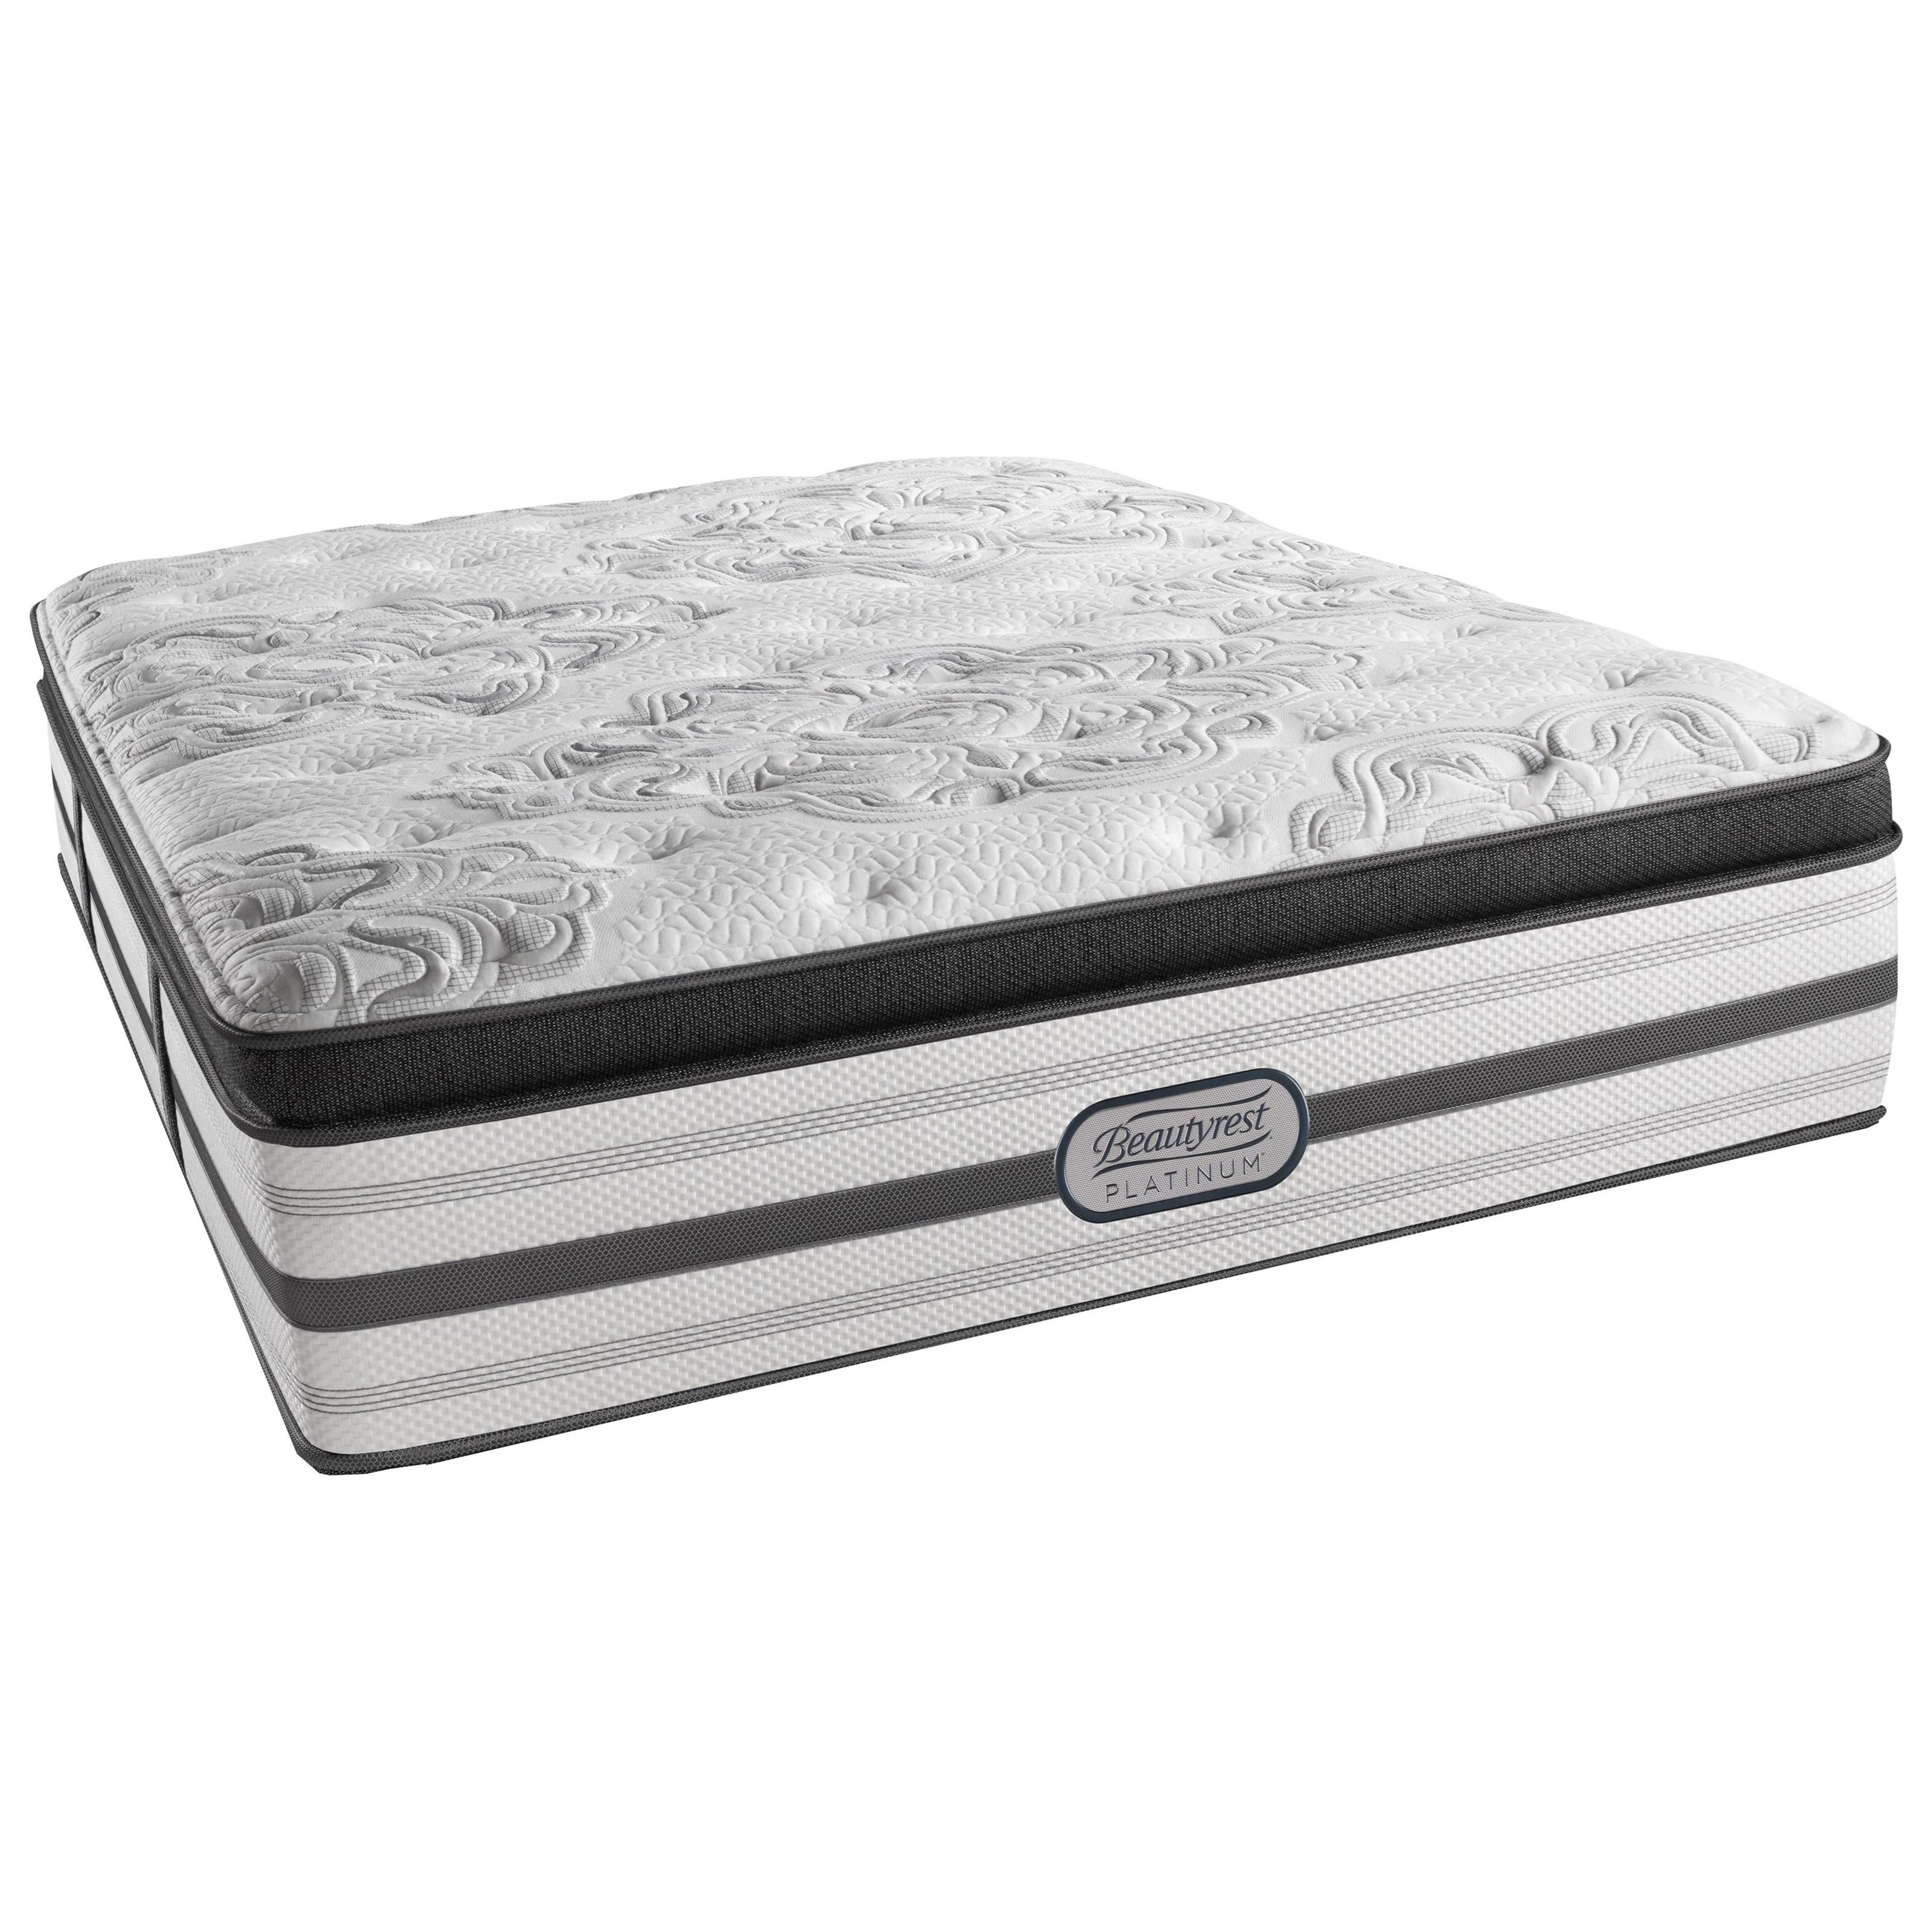 Beautyrest Platinum Katherine Twin XL Box Top Adjustable Set - Item Number: LV4PLBT-TXL+SM2-TXL